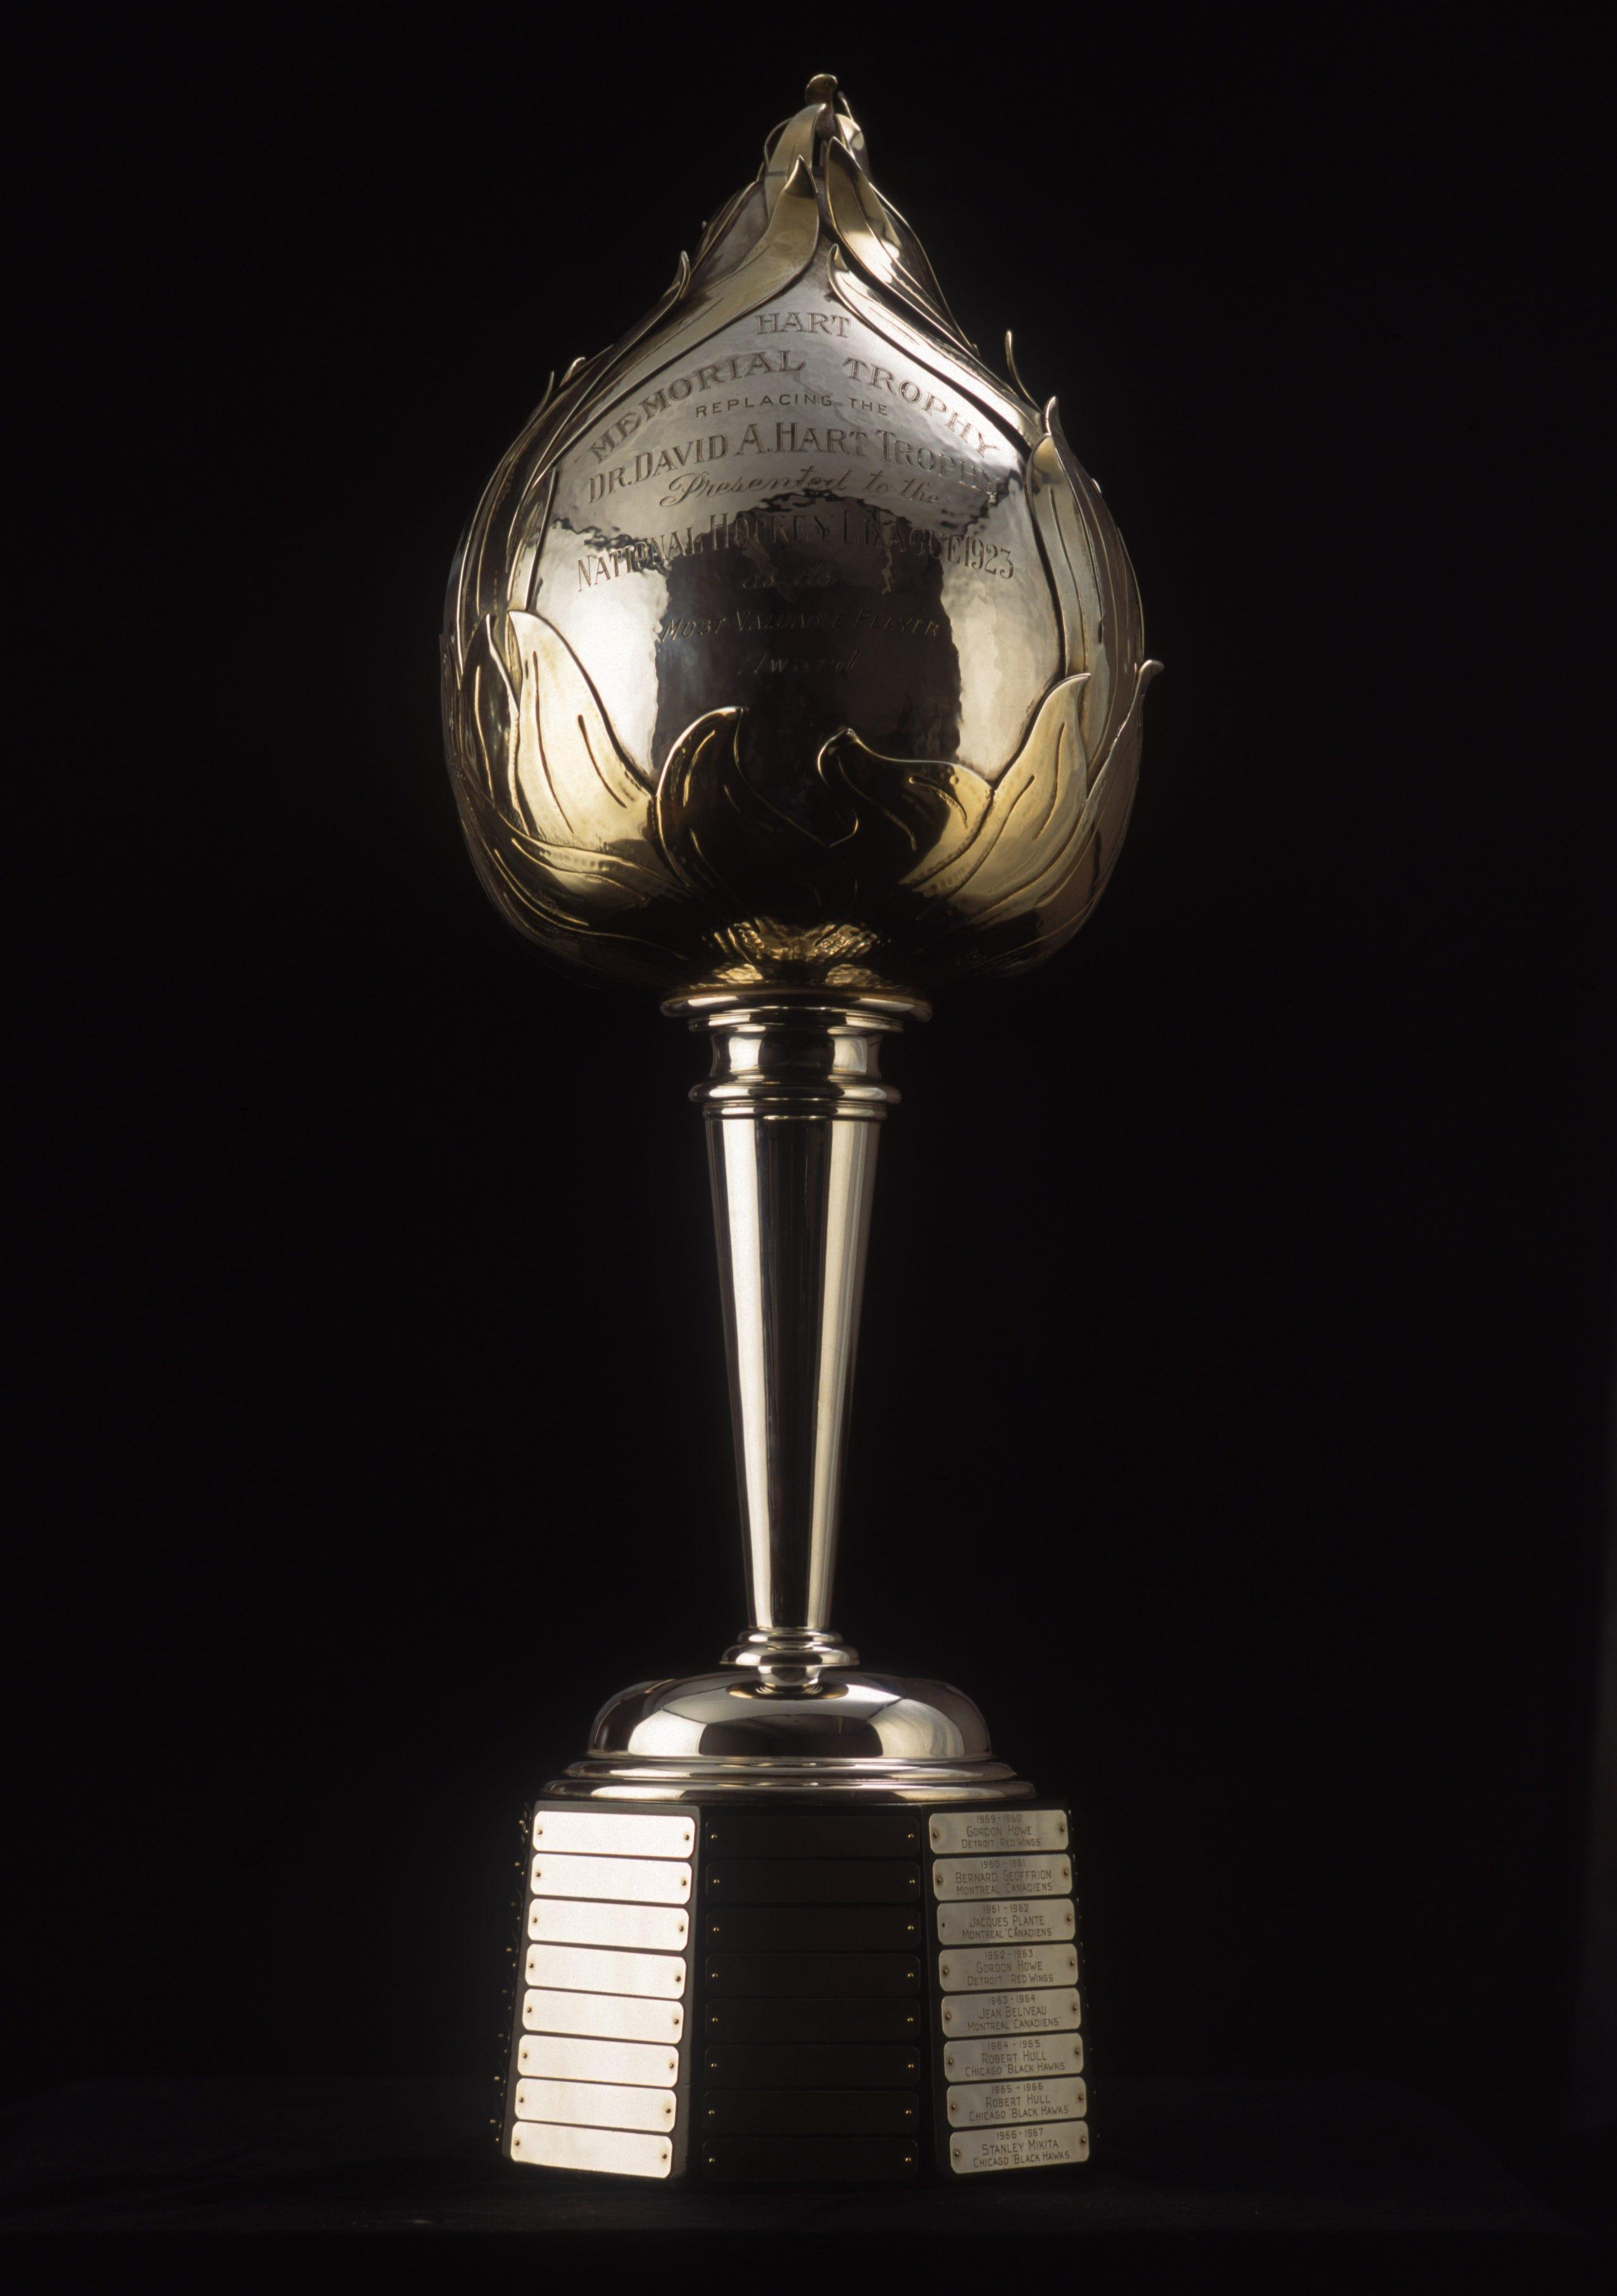 2021 NHL awards season